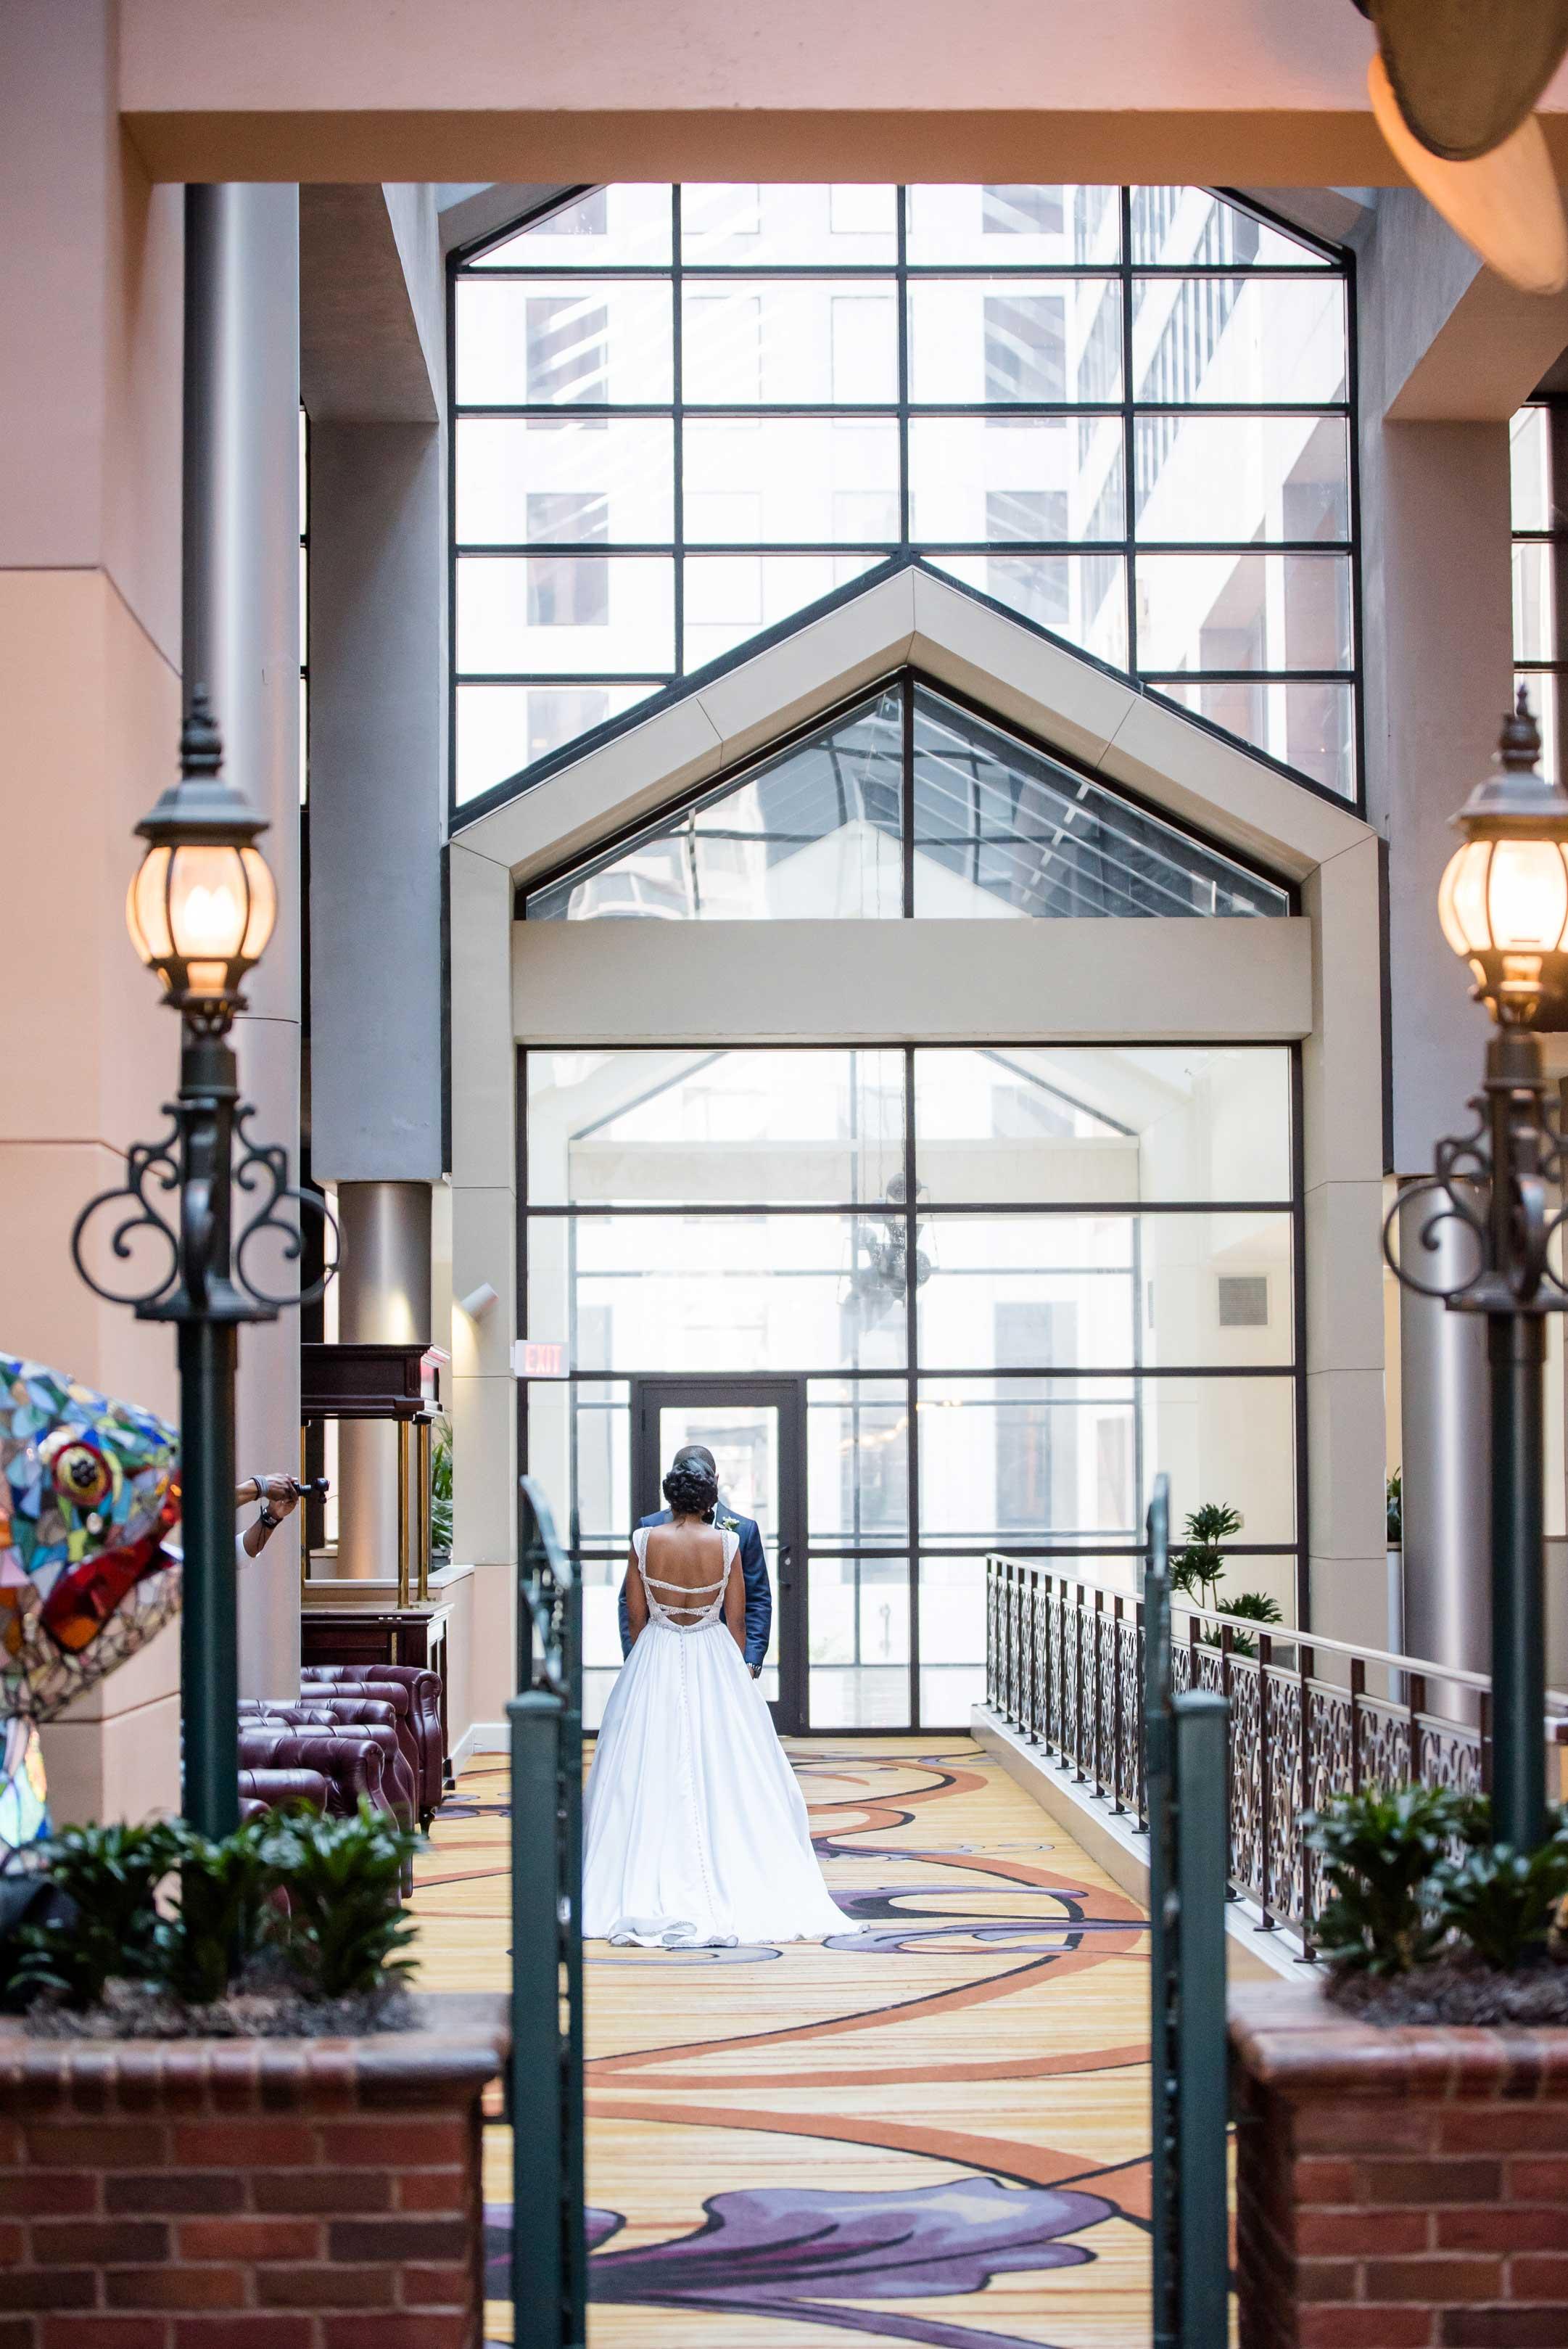 ronnie-bliss-new-orleans-wedding-photographer-223.jpg